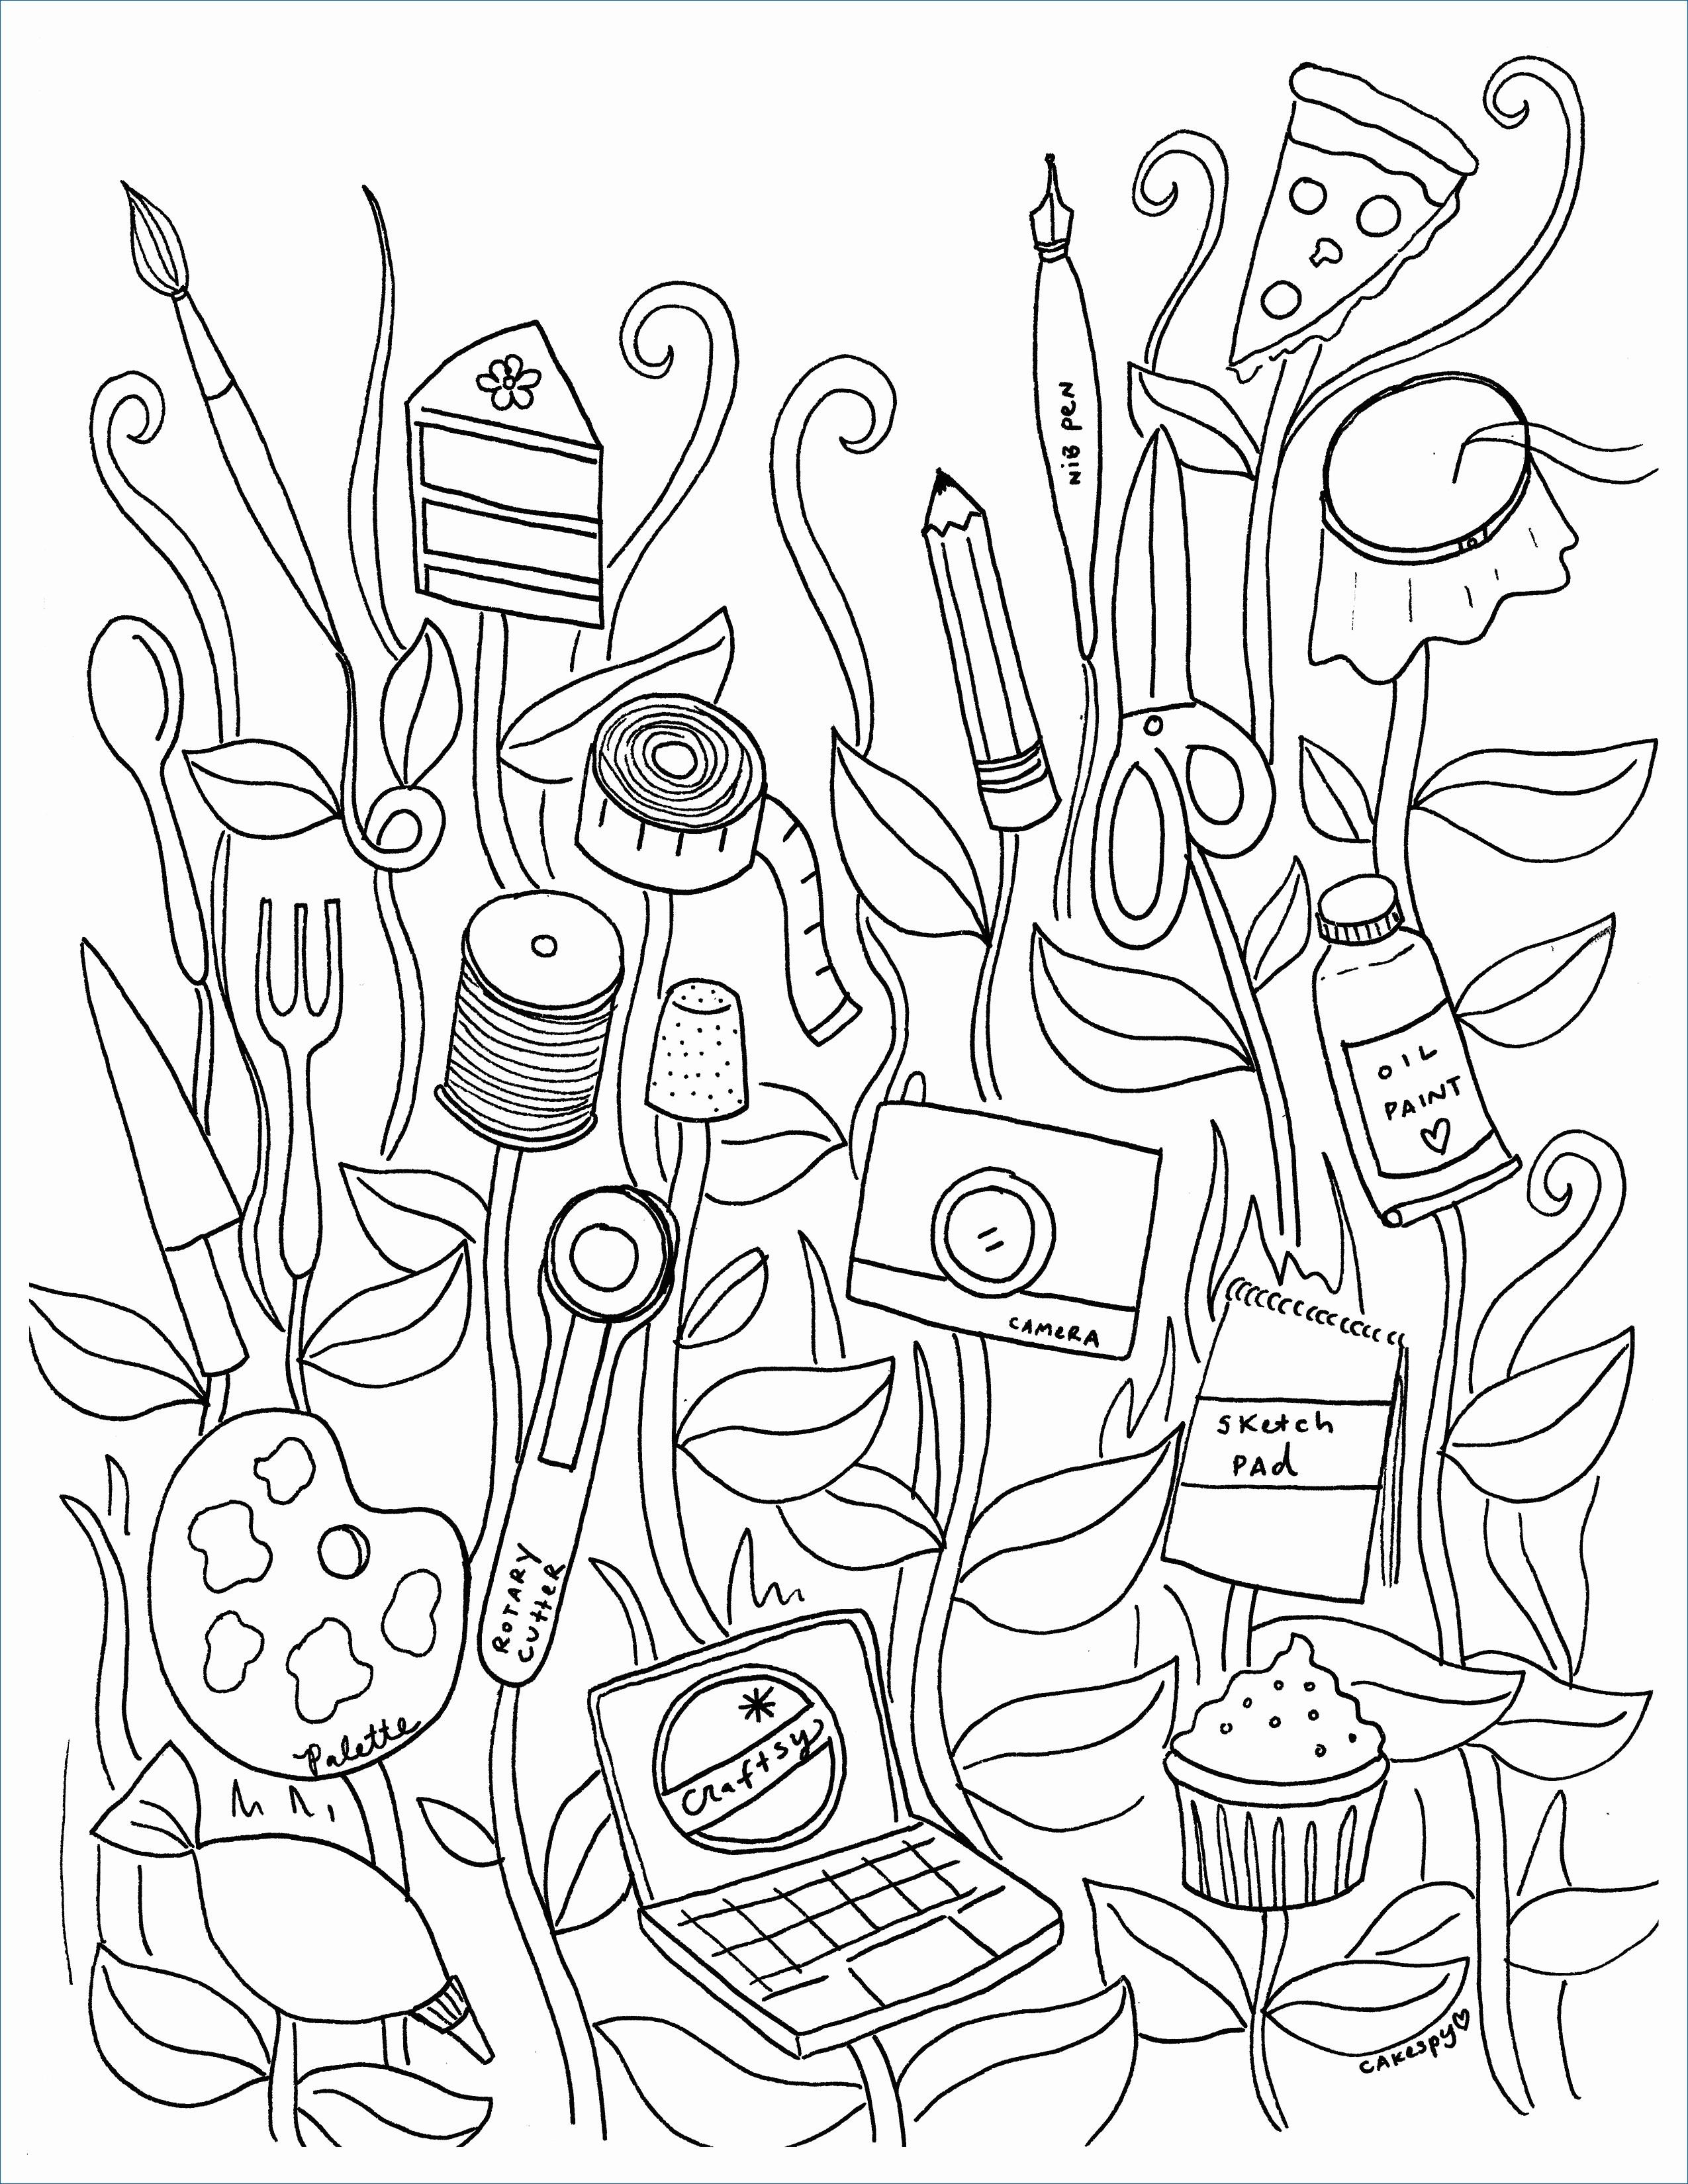 Mia and Me Ausmalbilder Einzigartig Coloring for Me Best 40 Mia Me Ausmalbilder Scoredatscore Bilder